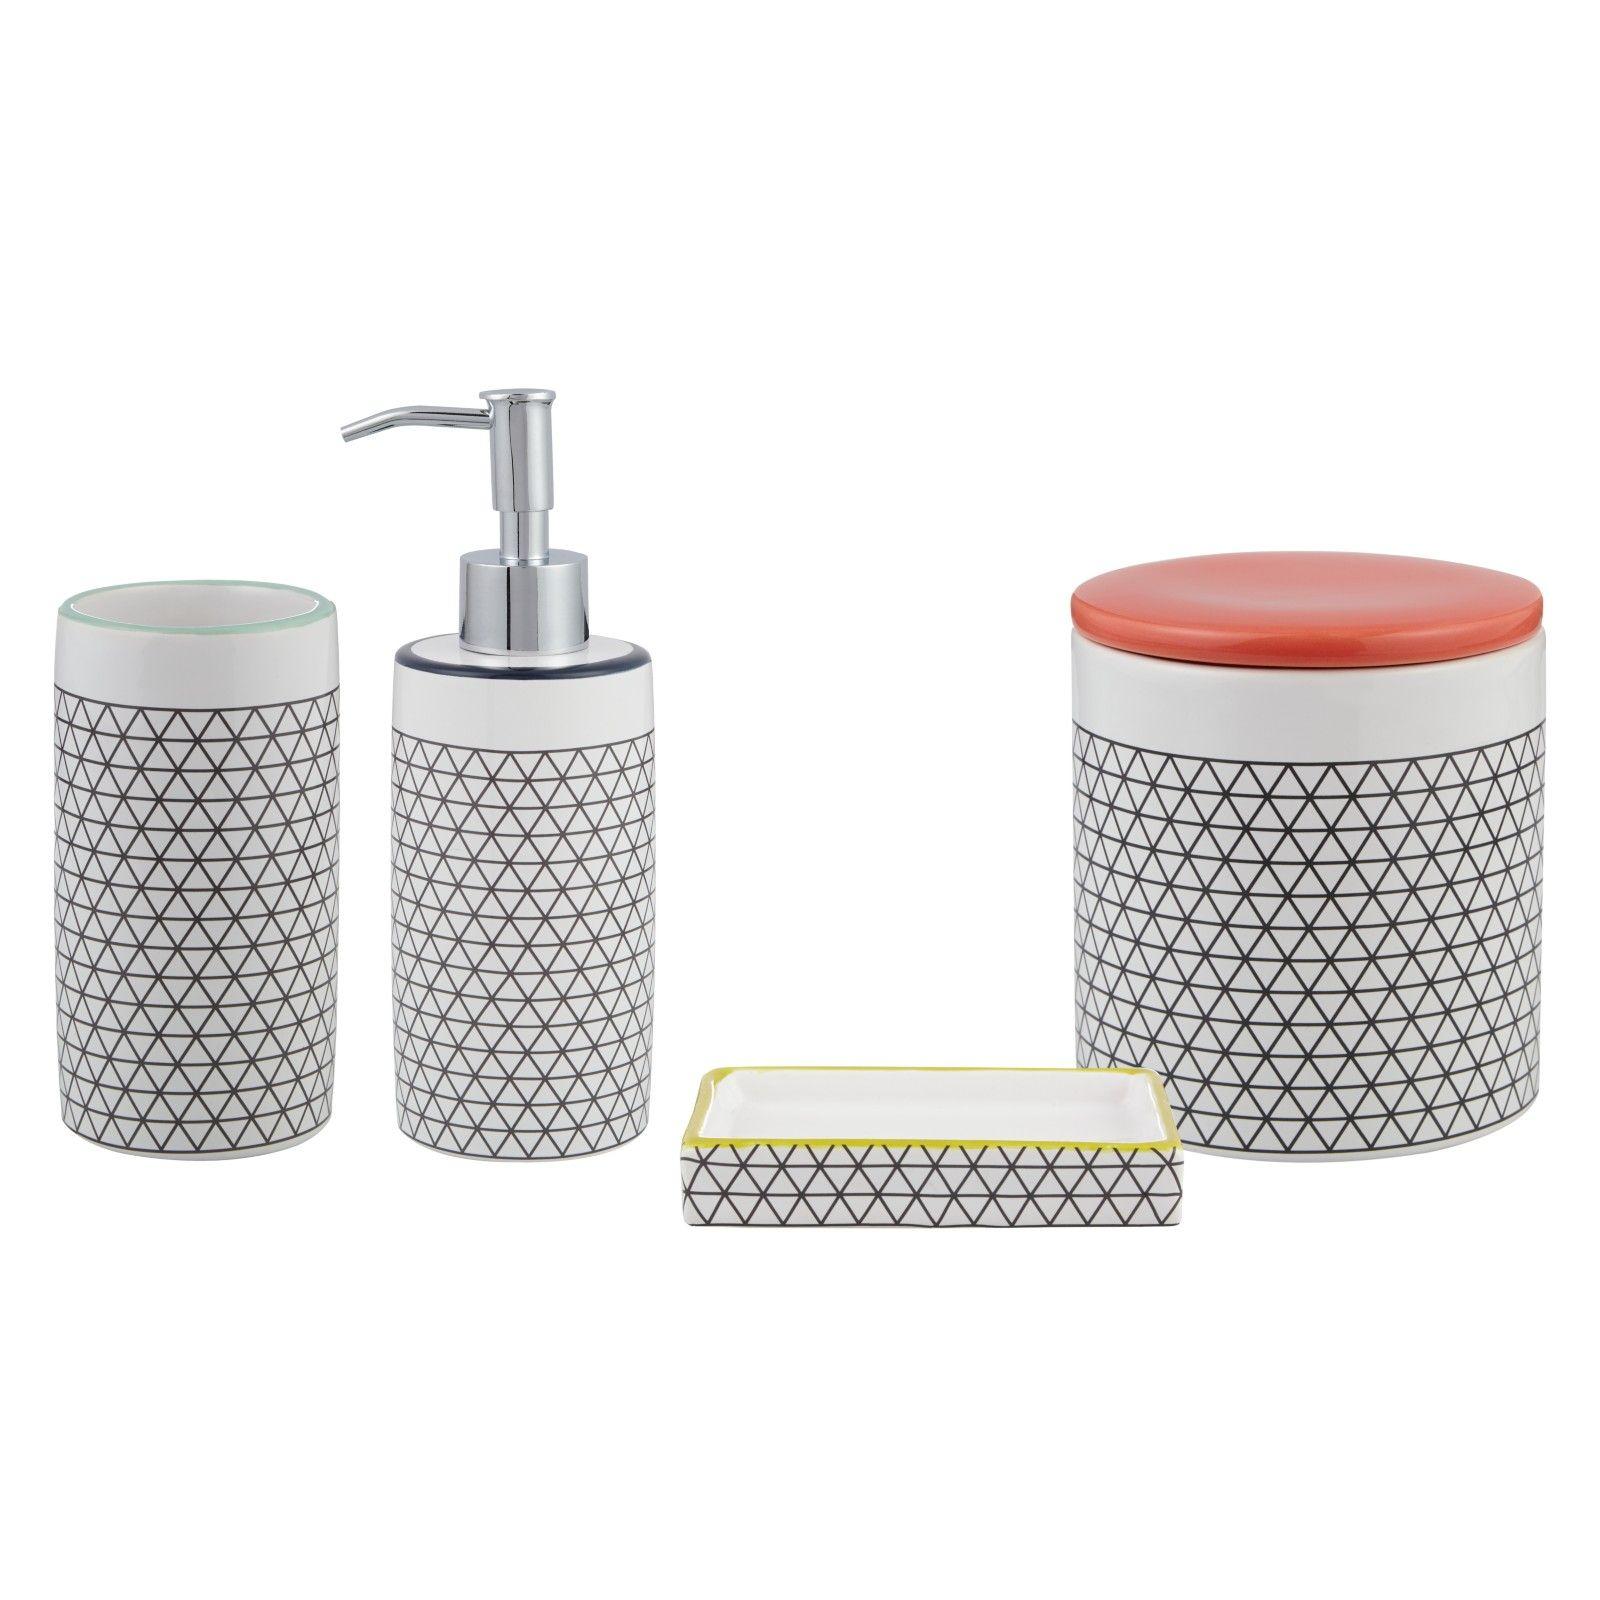 Bathroom accessories john lewis - Buy House By John Lewis Isometric Bathroom Accessories Online At Johnlewis Com